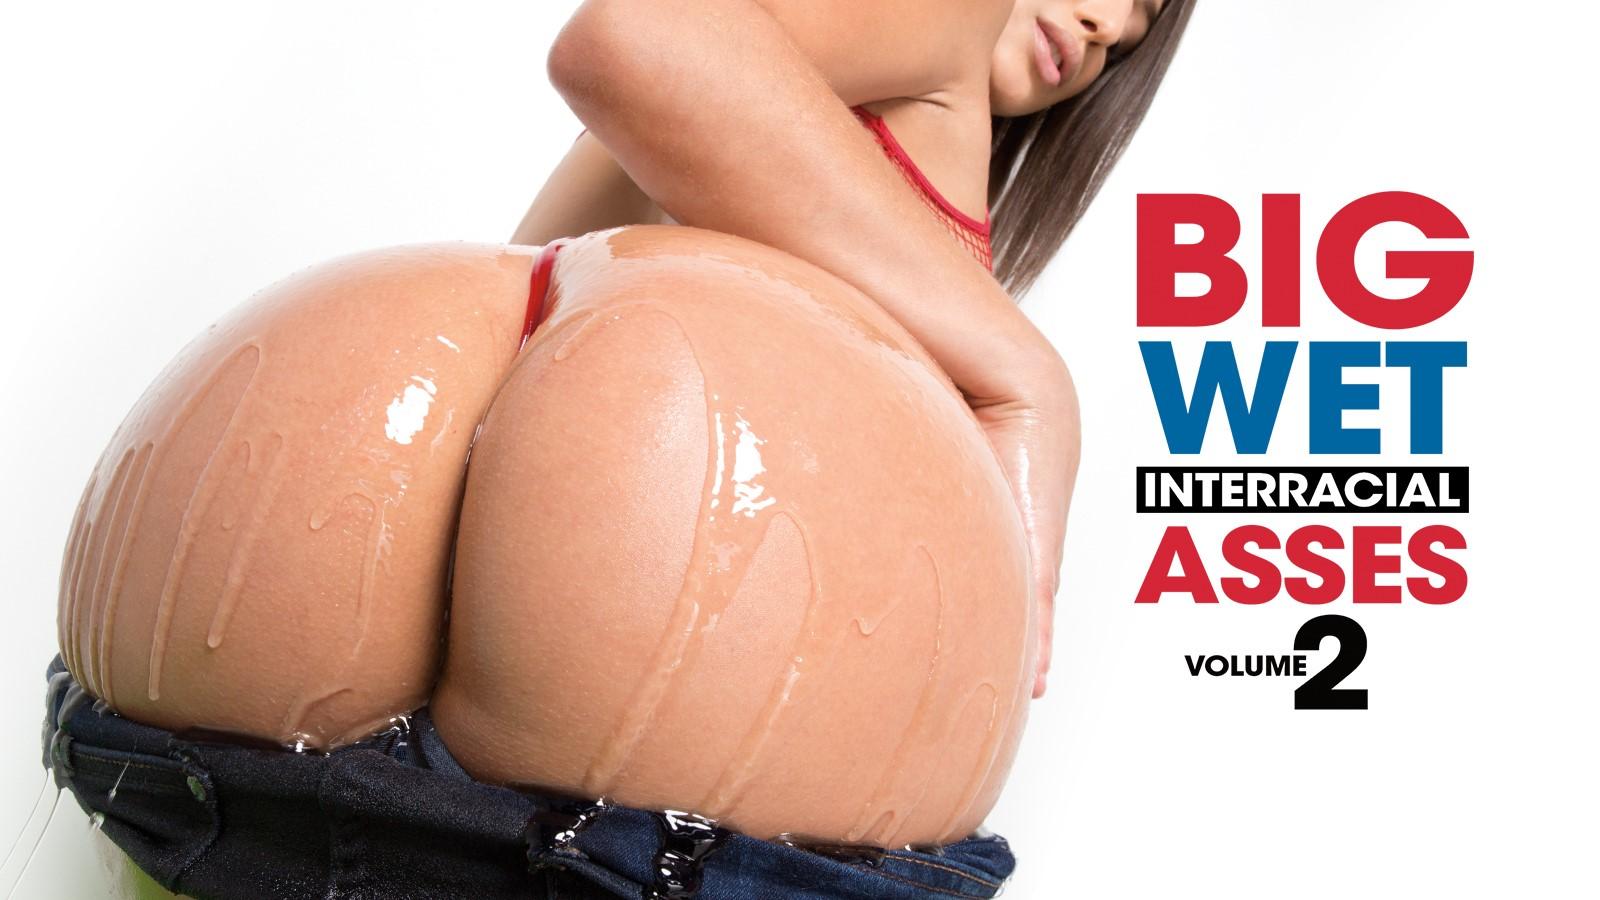 That Glistening Ass Nina Elle Ricky Johnson Big Wet Butts